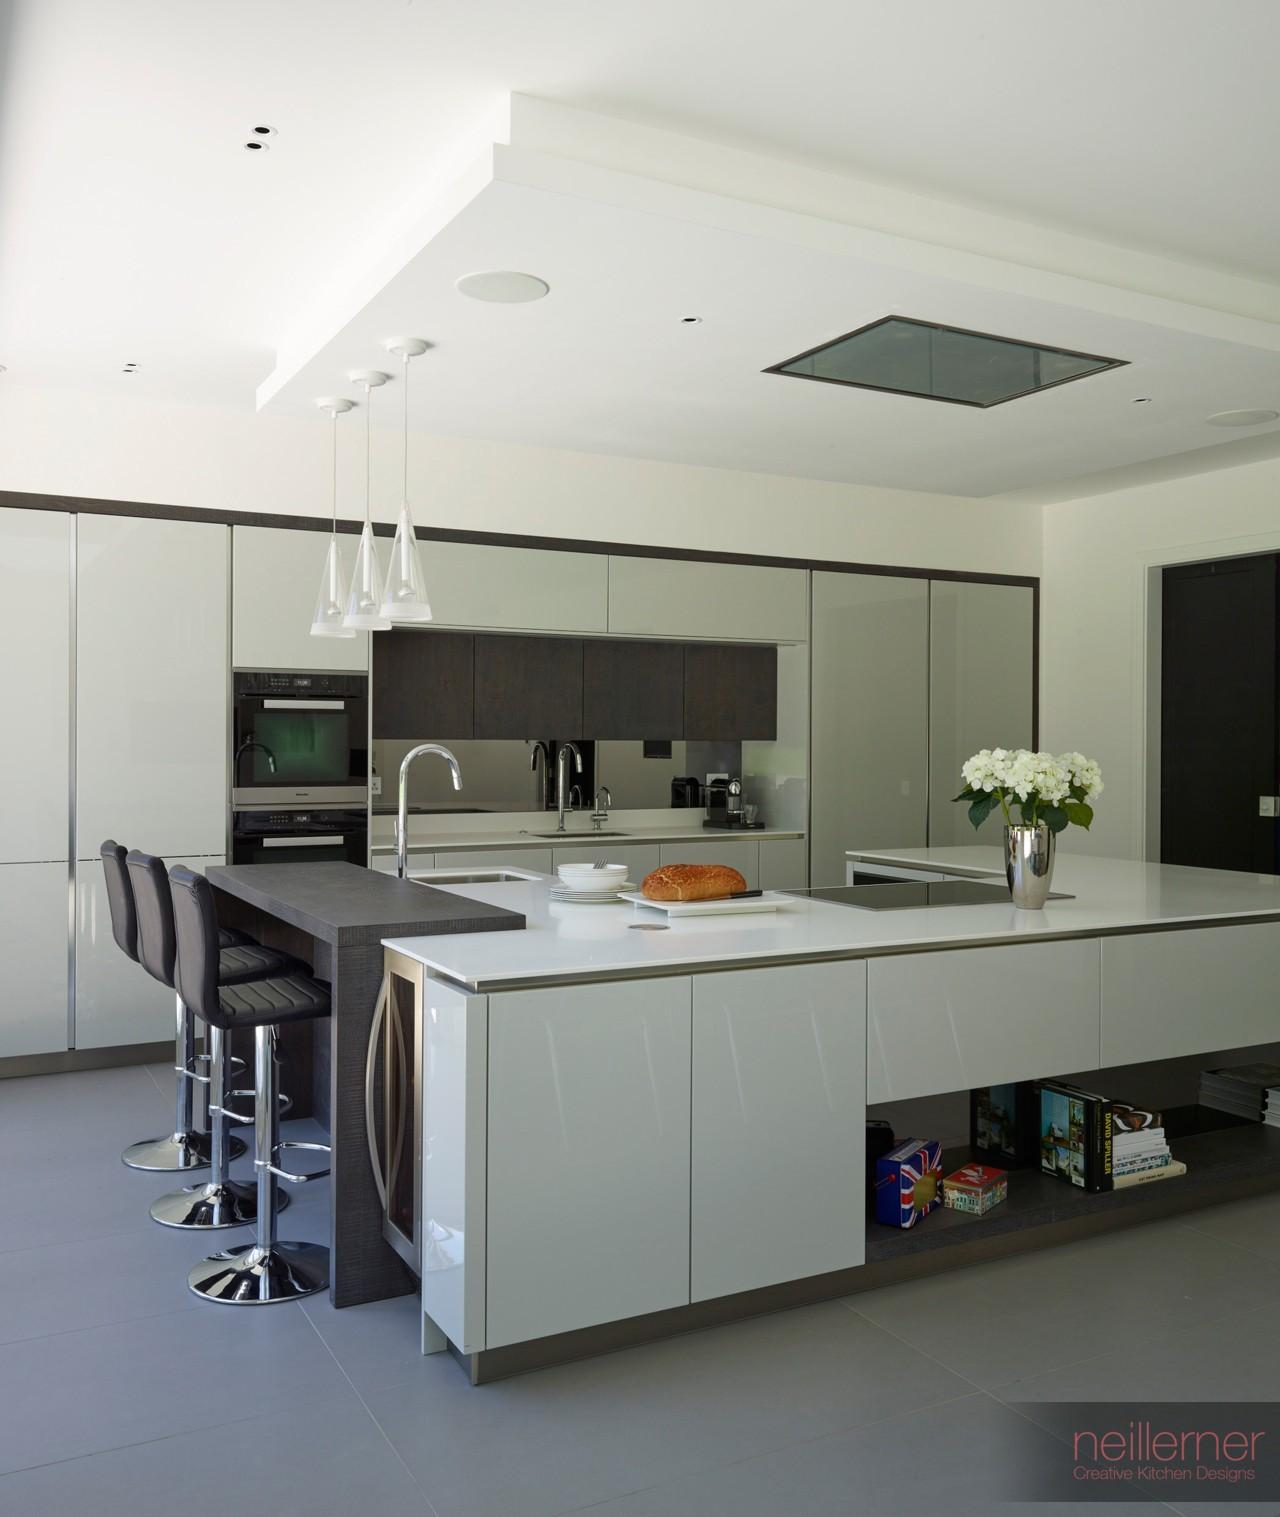 New Modern Kitchens At Neil Lerner: Modern Gloss Kitchens